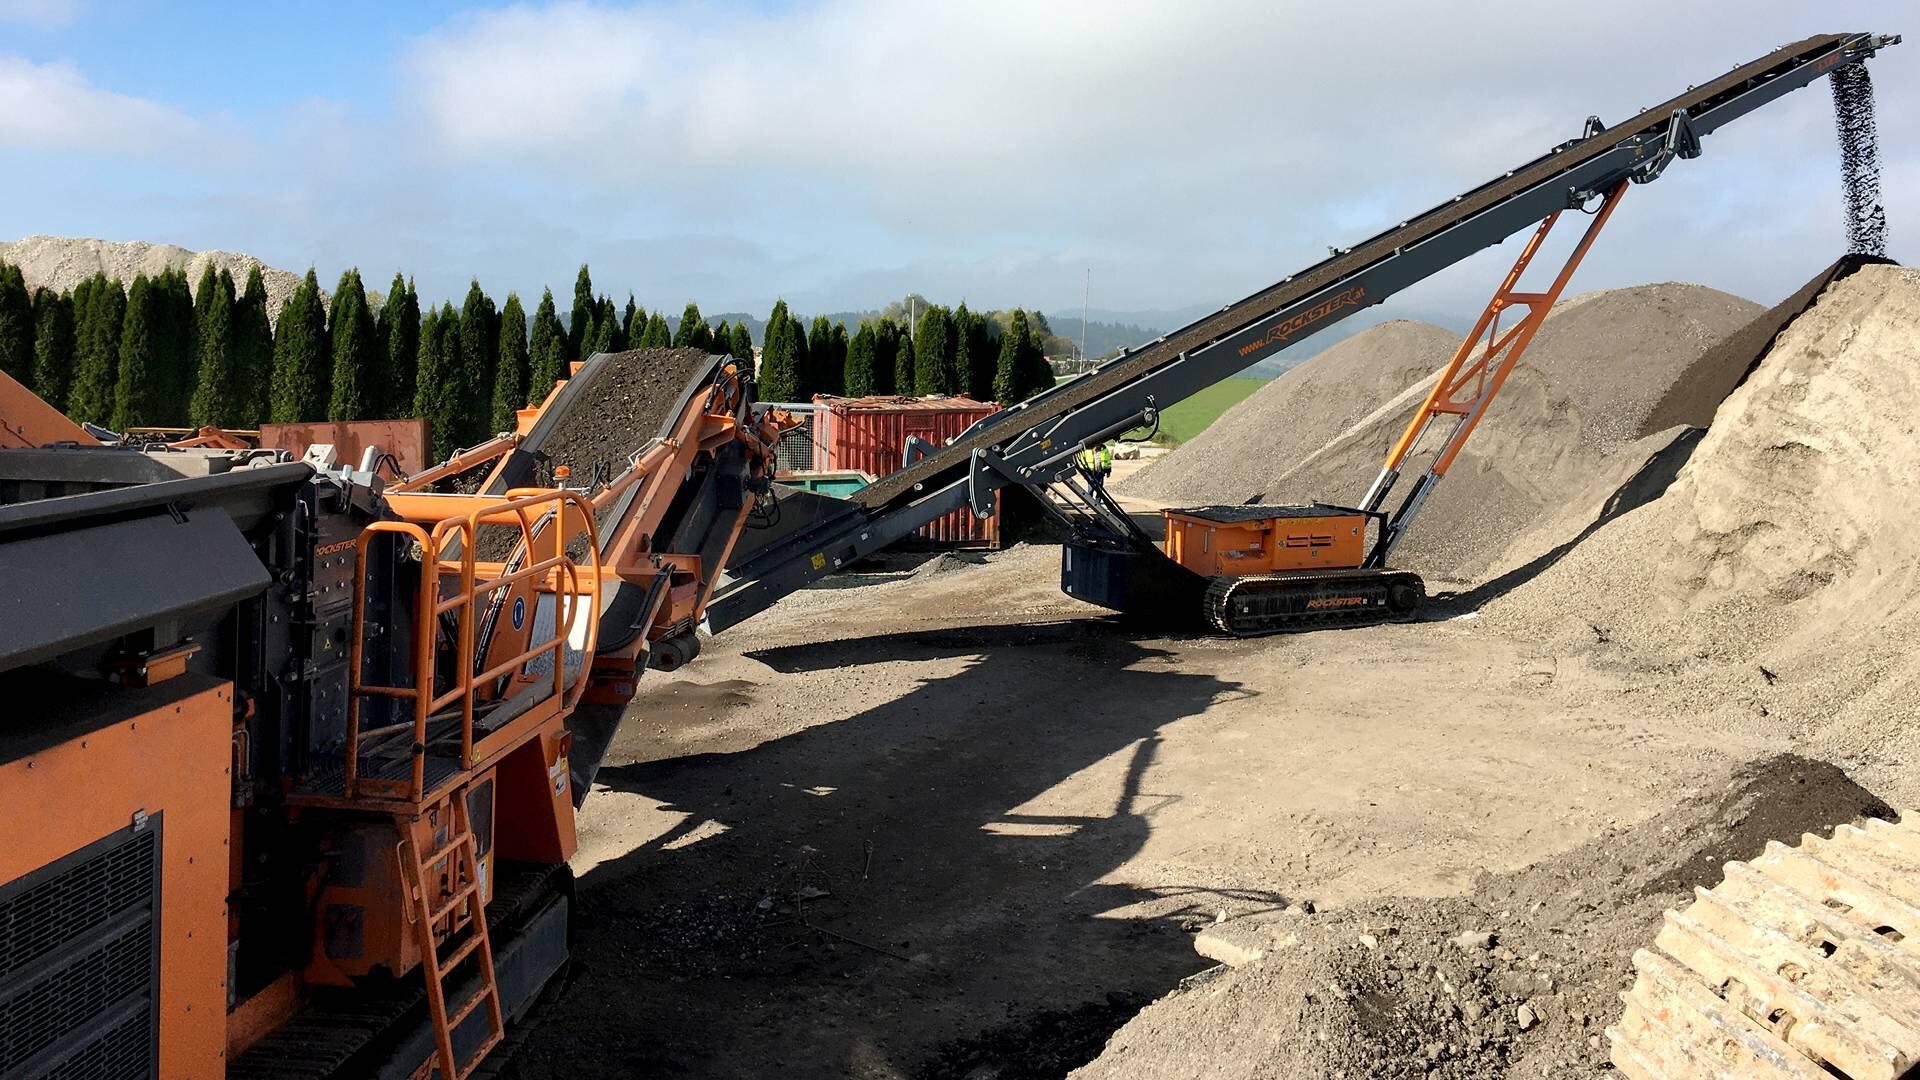 Gallery image 2 - ASPHALT - Rockster R1100S impact crusher & track-mounted RST23 stacker recycling asphalt